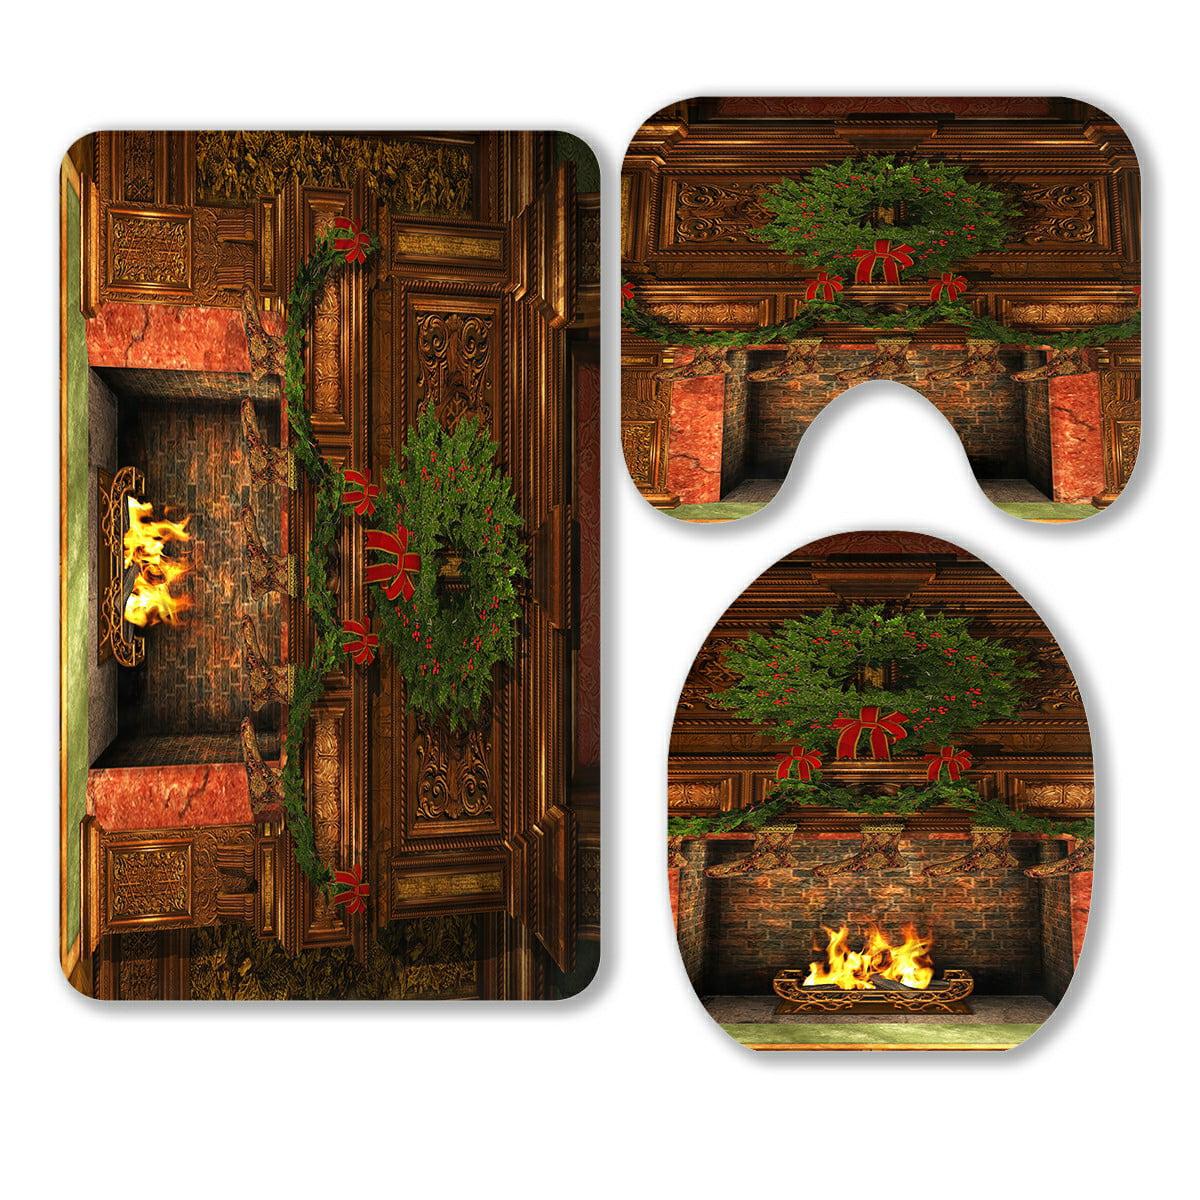 Abphqto Fireplace Christmas Holly Wreath Garland Stockings 3 Piece Bathroom Rugs Set Bath Rug Contour Mat And Toilet Lid Cover Walmart Com Walmart Com